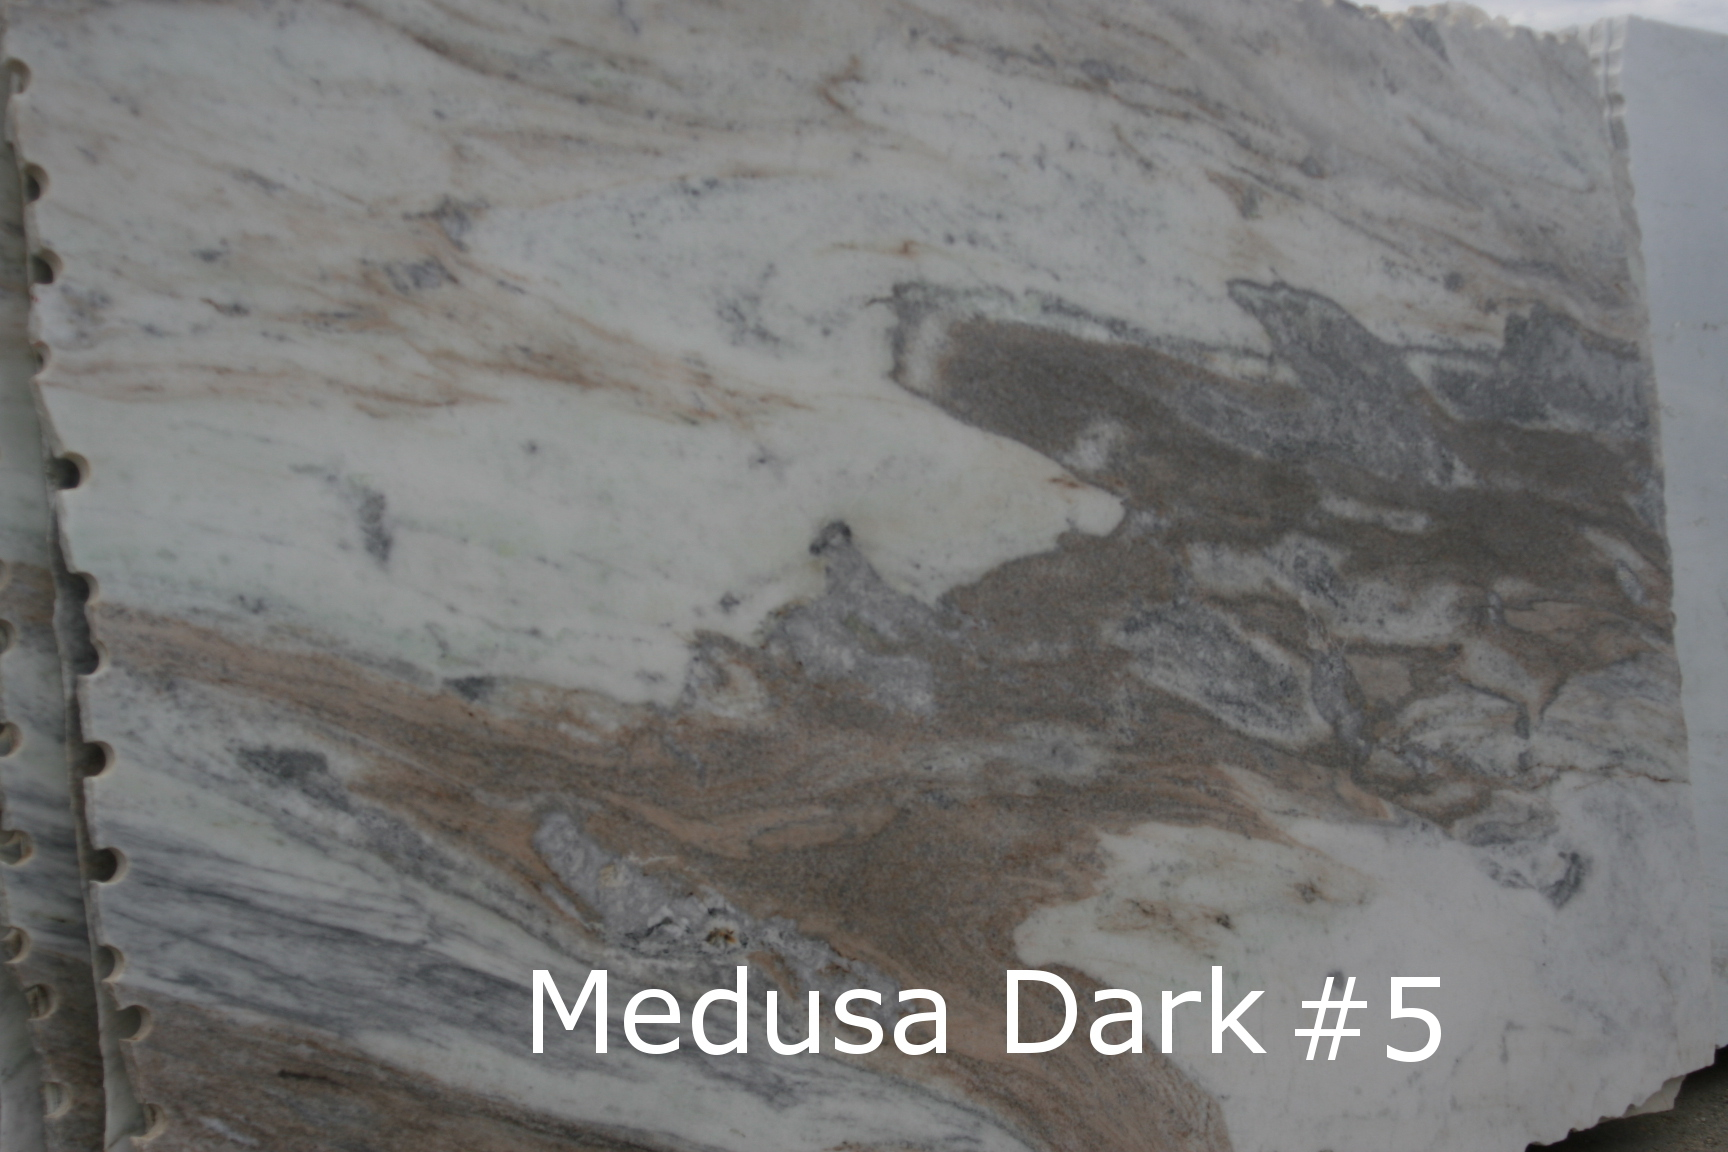 Medusa Dark #5